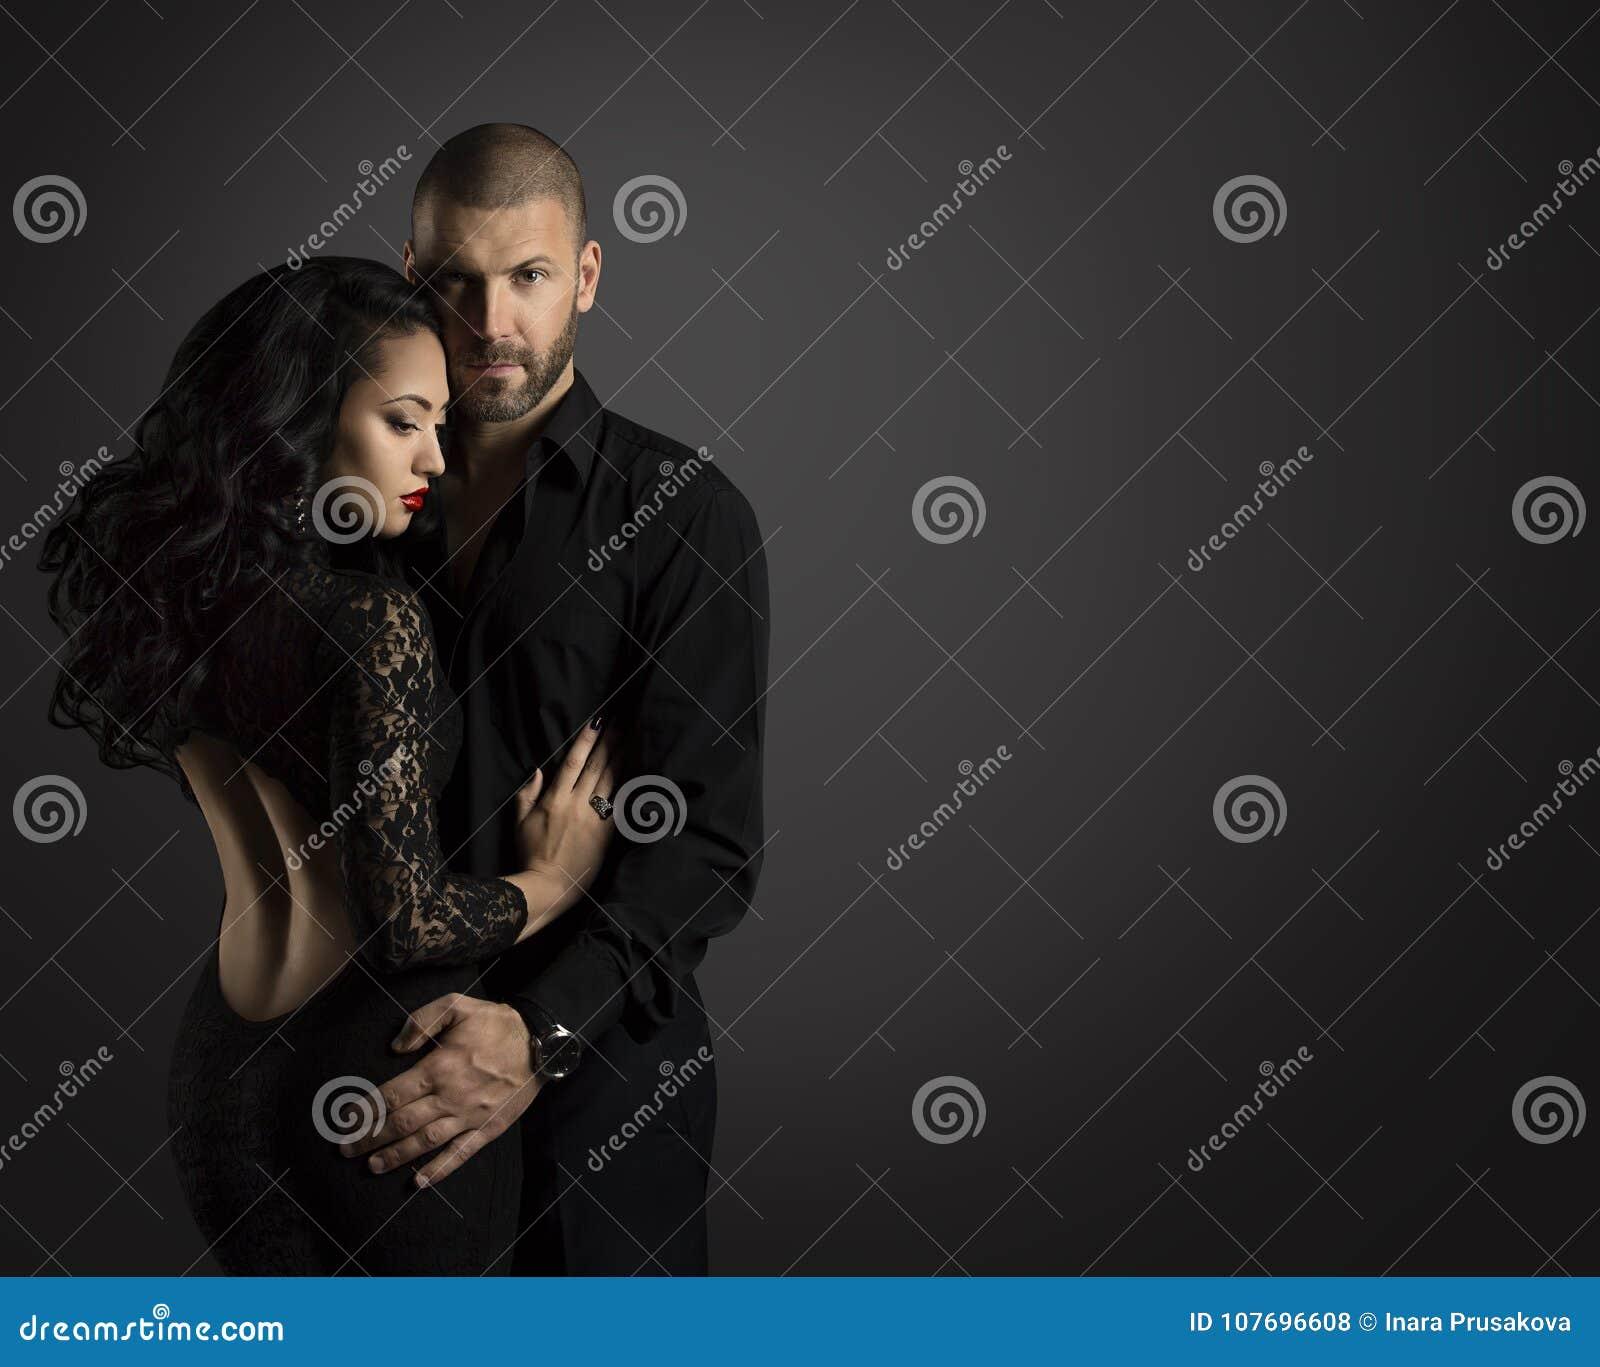 Couple Fashion Portrait, Young Man Embrace Woman in Black